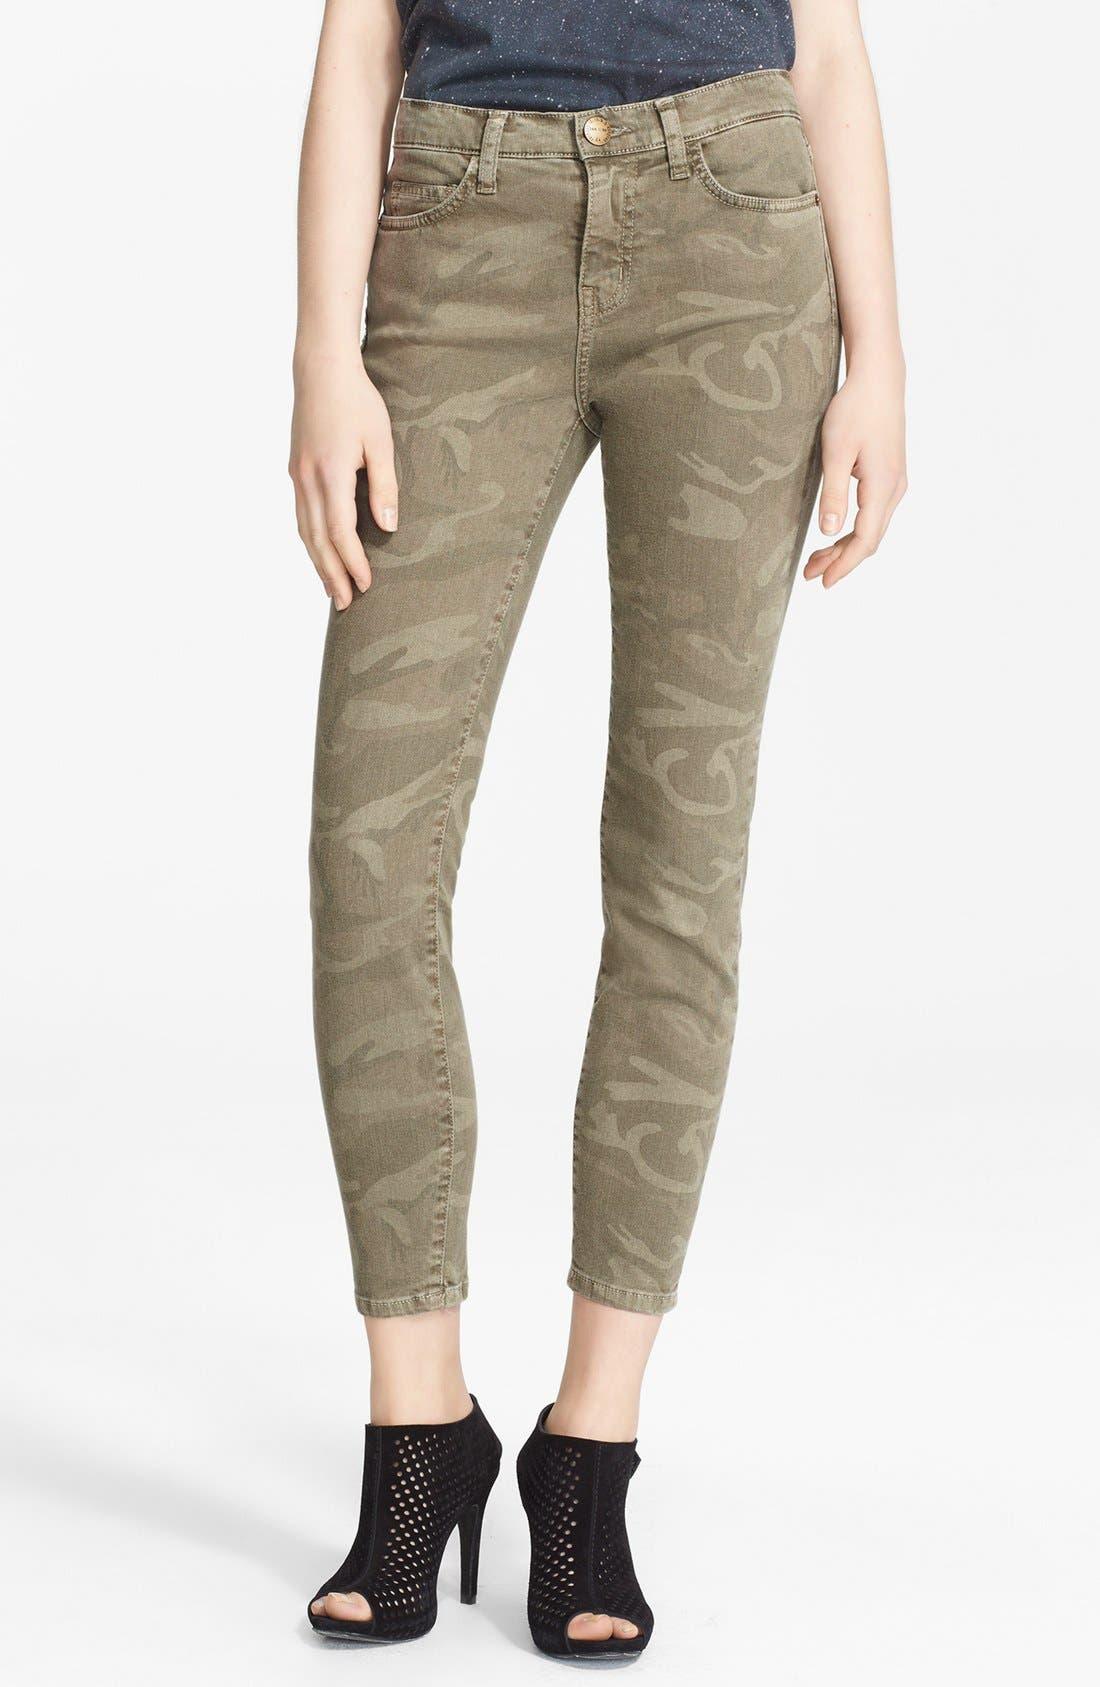 Alternate Image 1 Selected - Current/Elliott 'The Stiletto' Print Skinny Jeans (Camo)